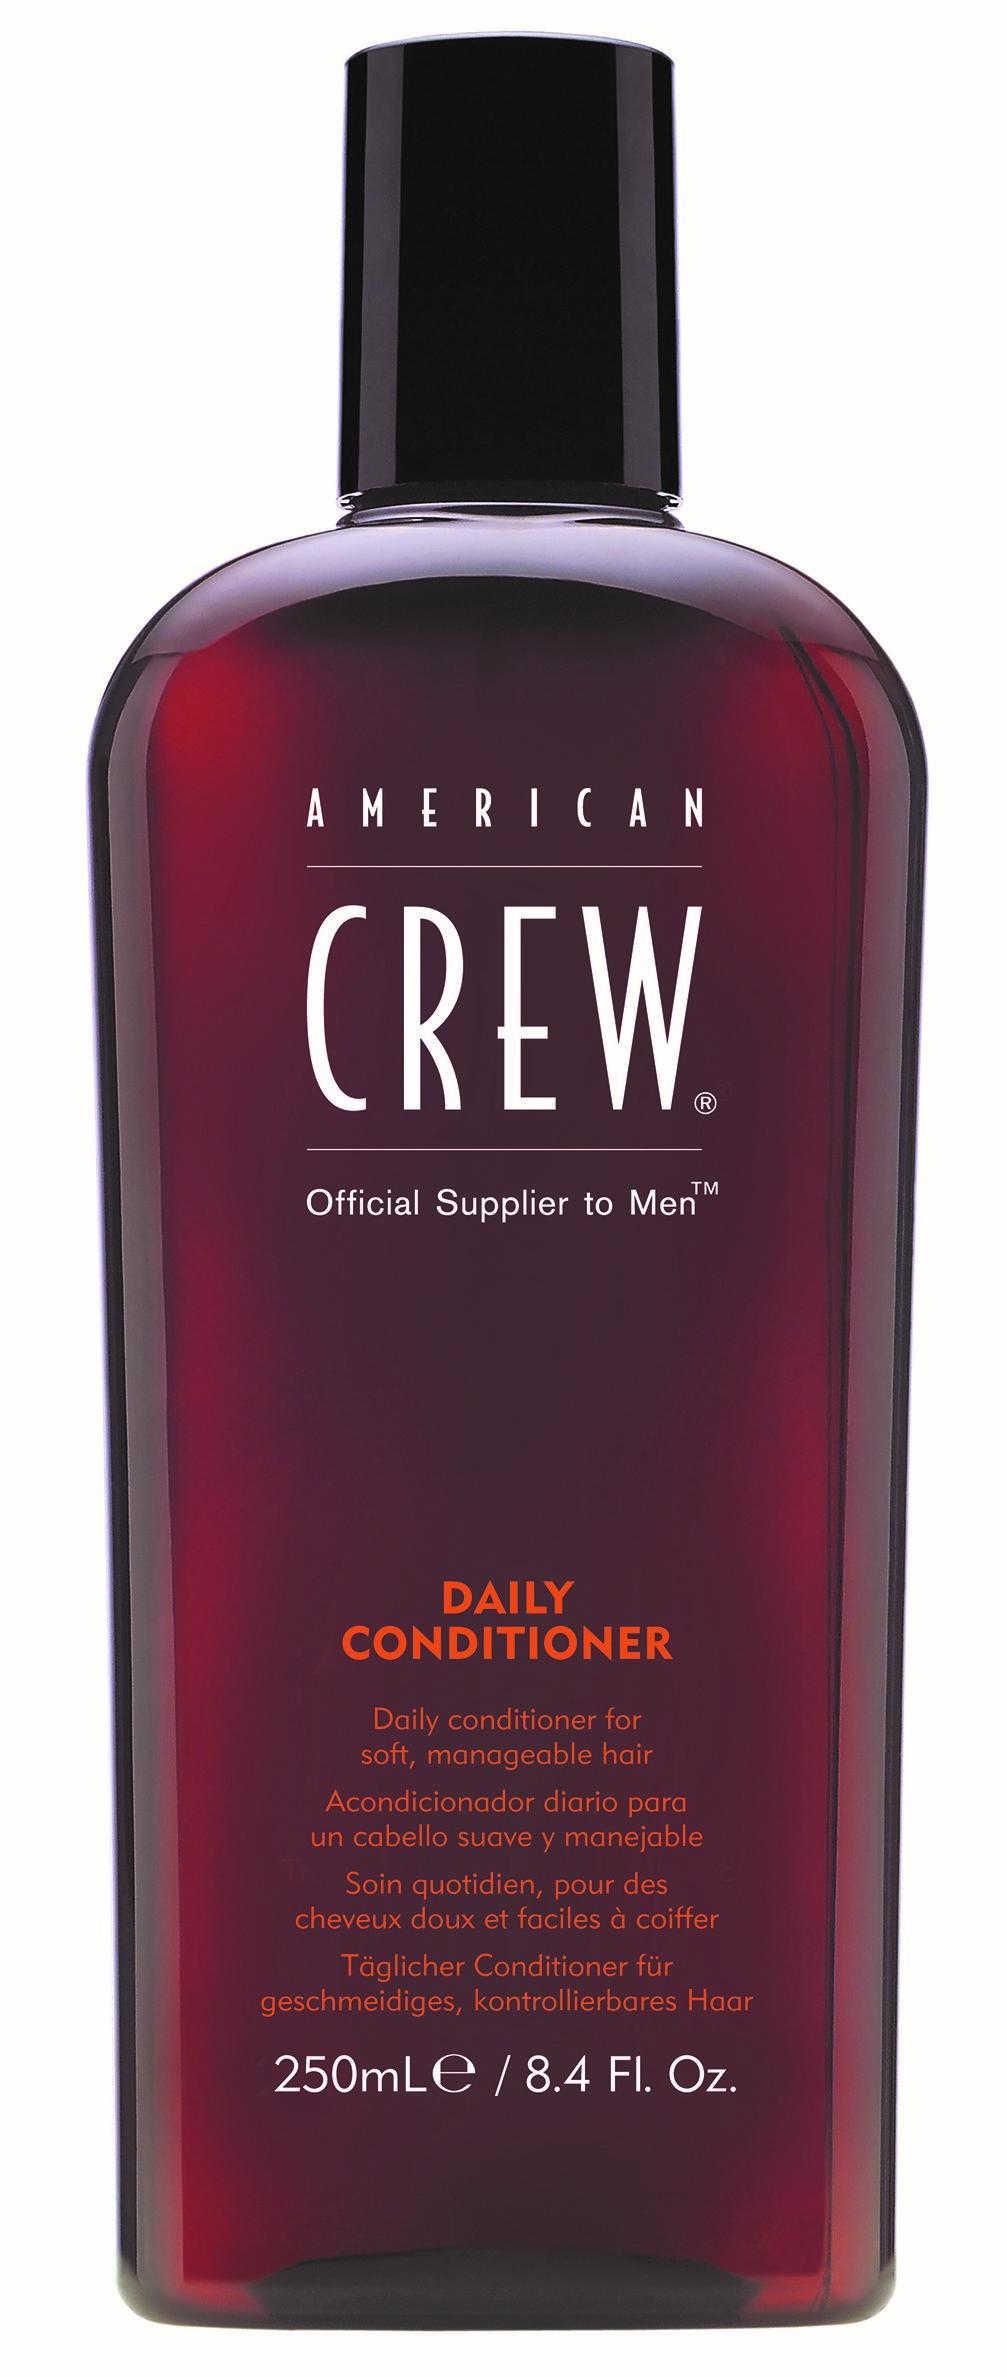 Кондиционер American Crew Daily Conditioner ежедневный 250 мл